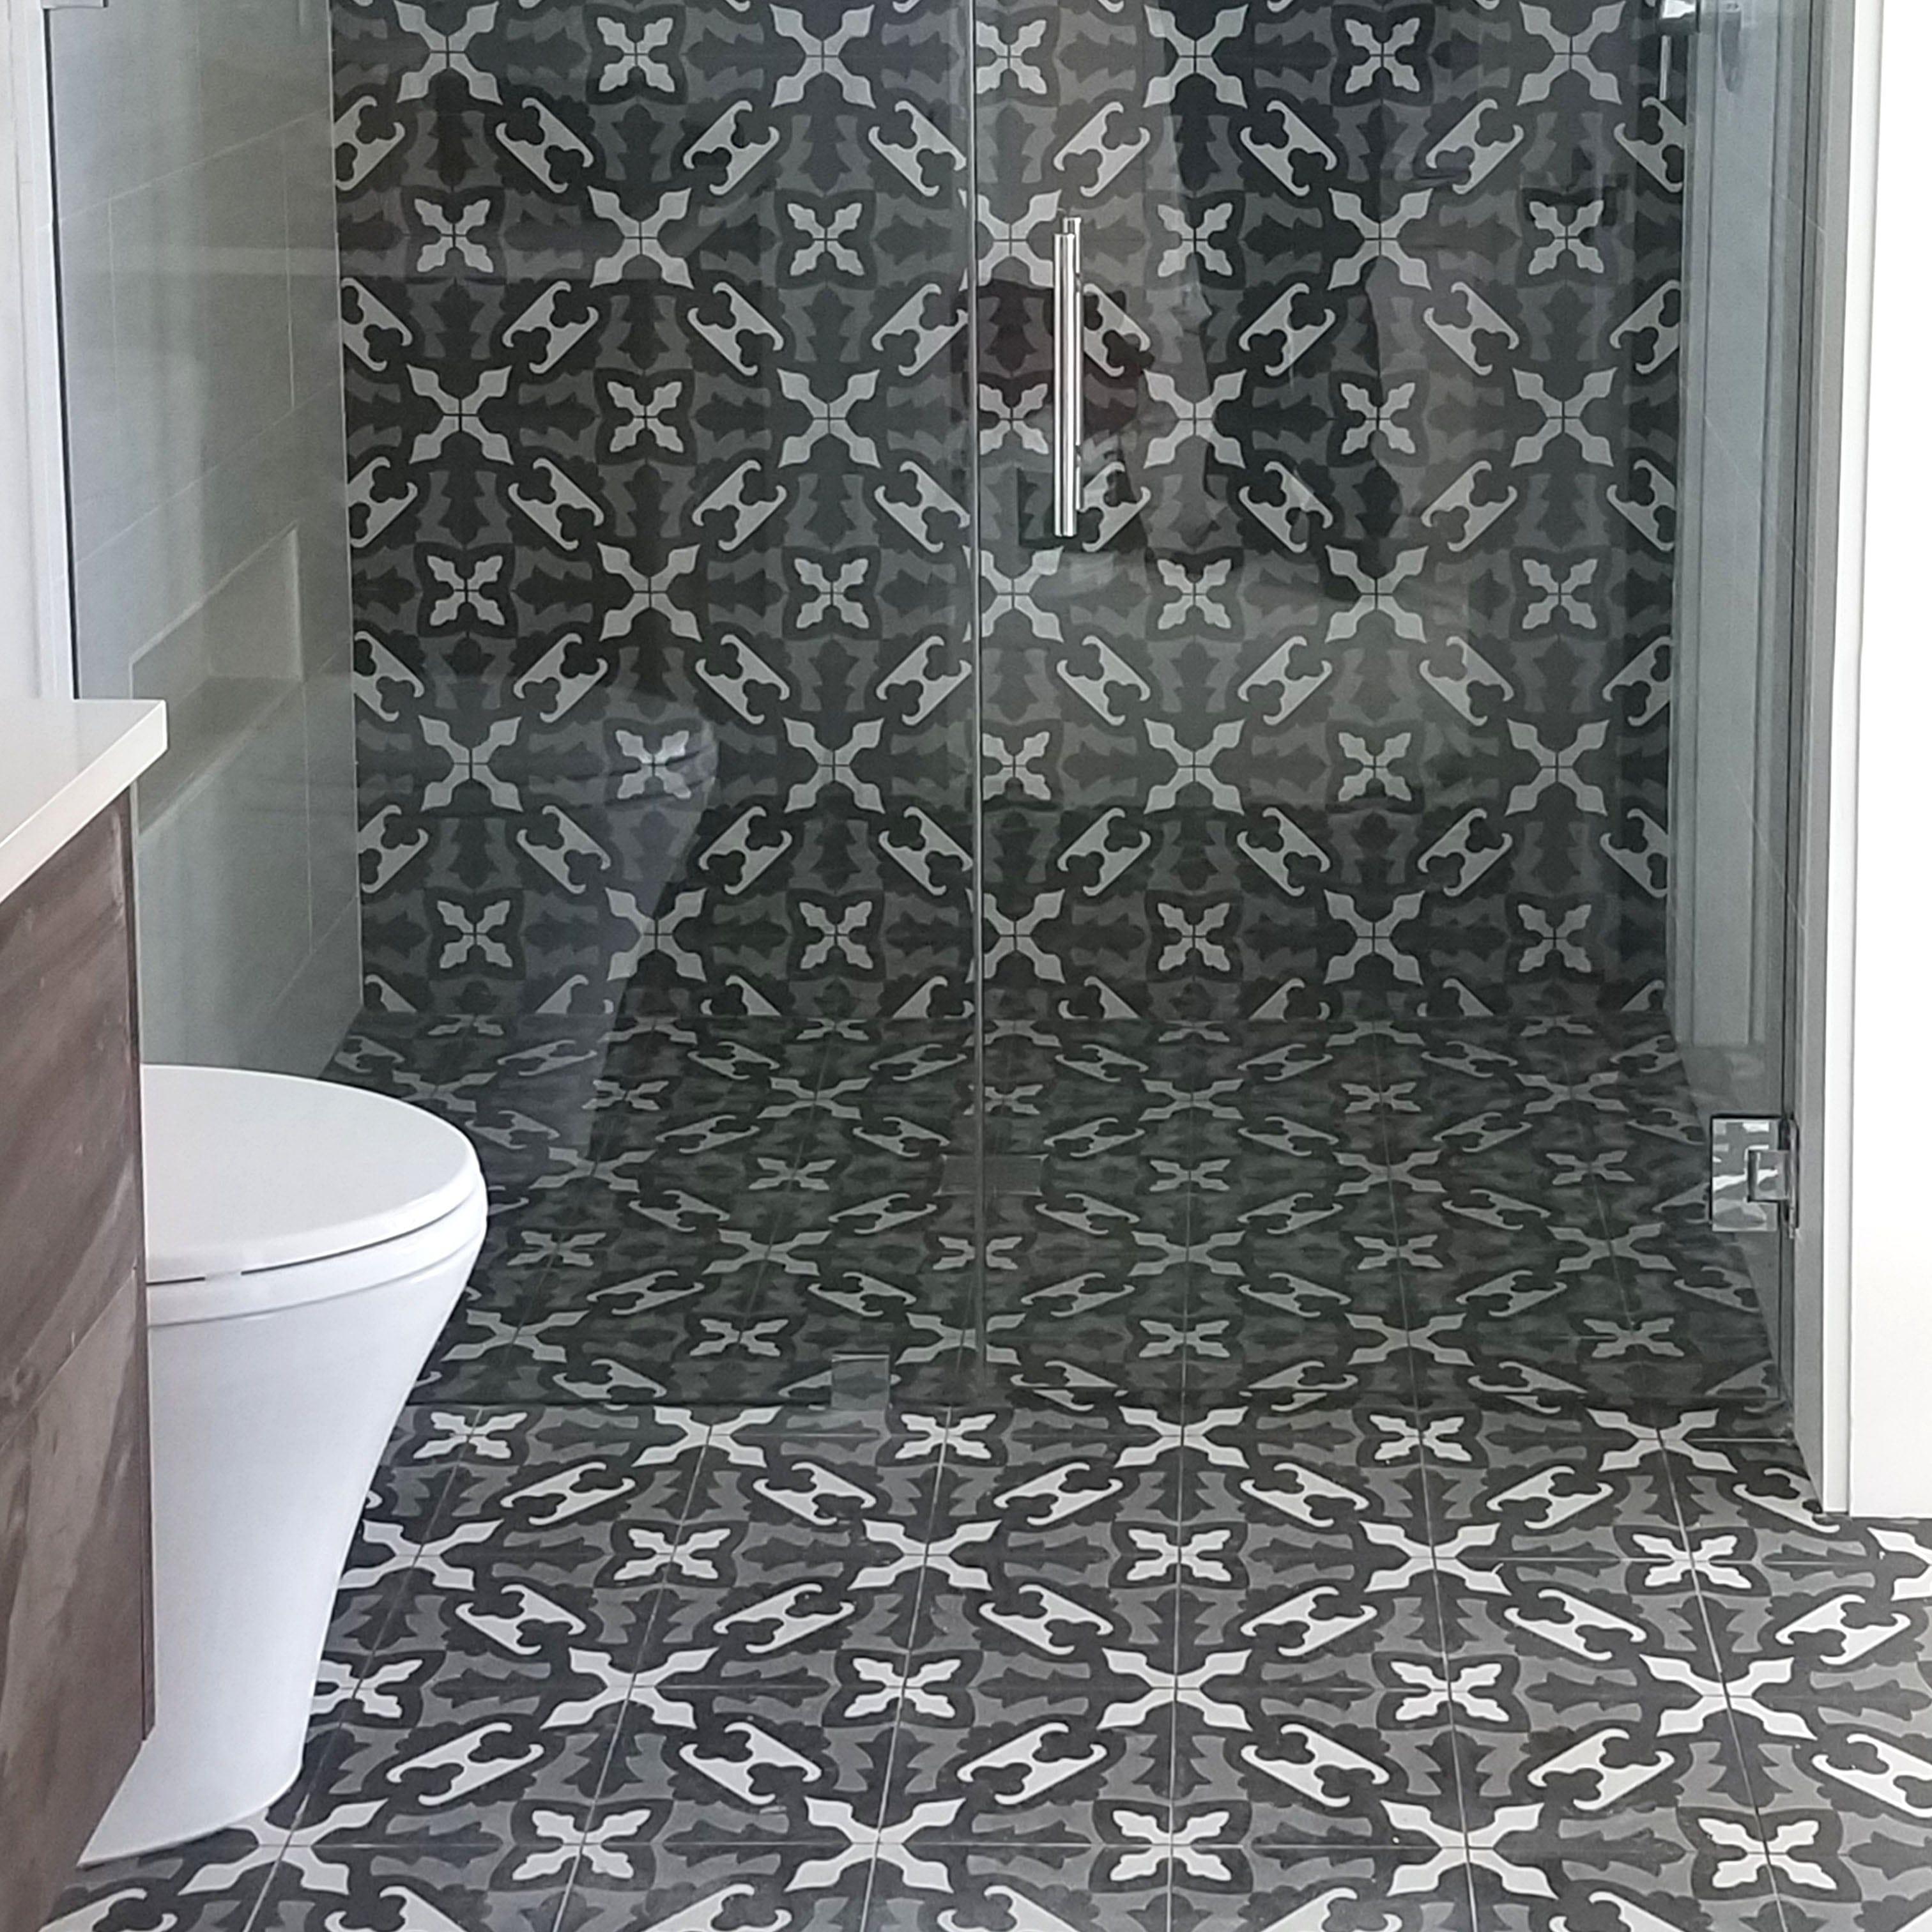 Farfalla Honed Cement Tiles 8x8